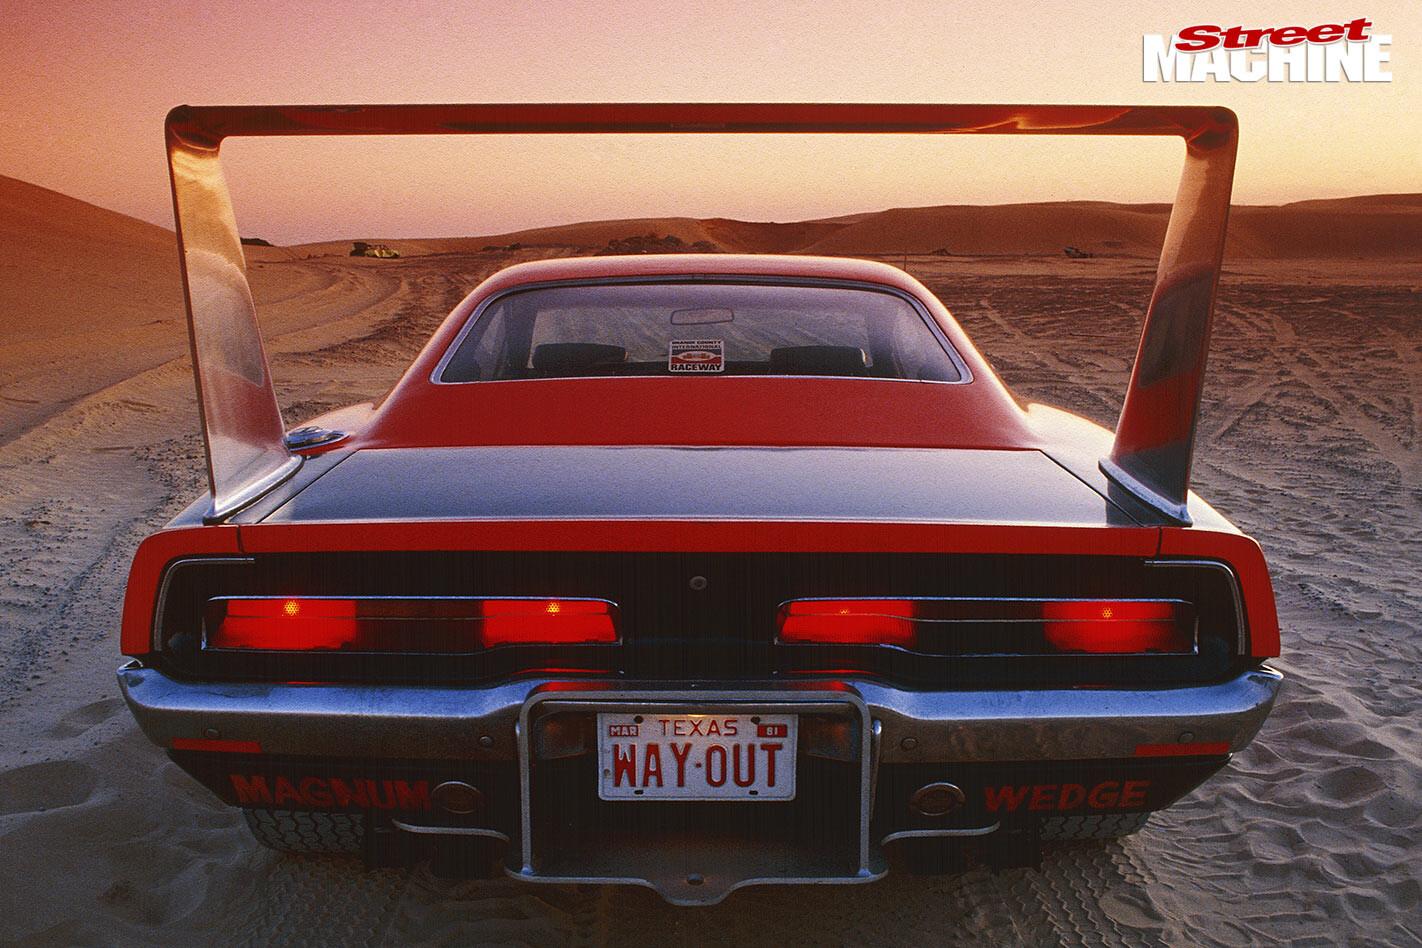 Dodge Charger Daytona rear